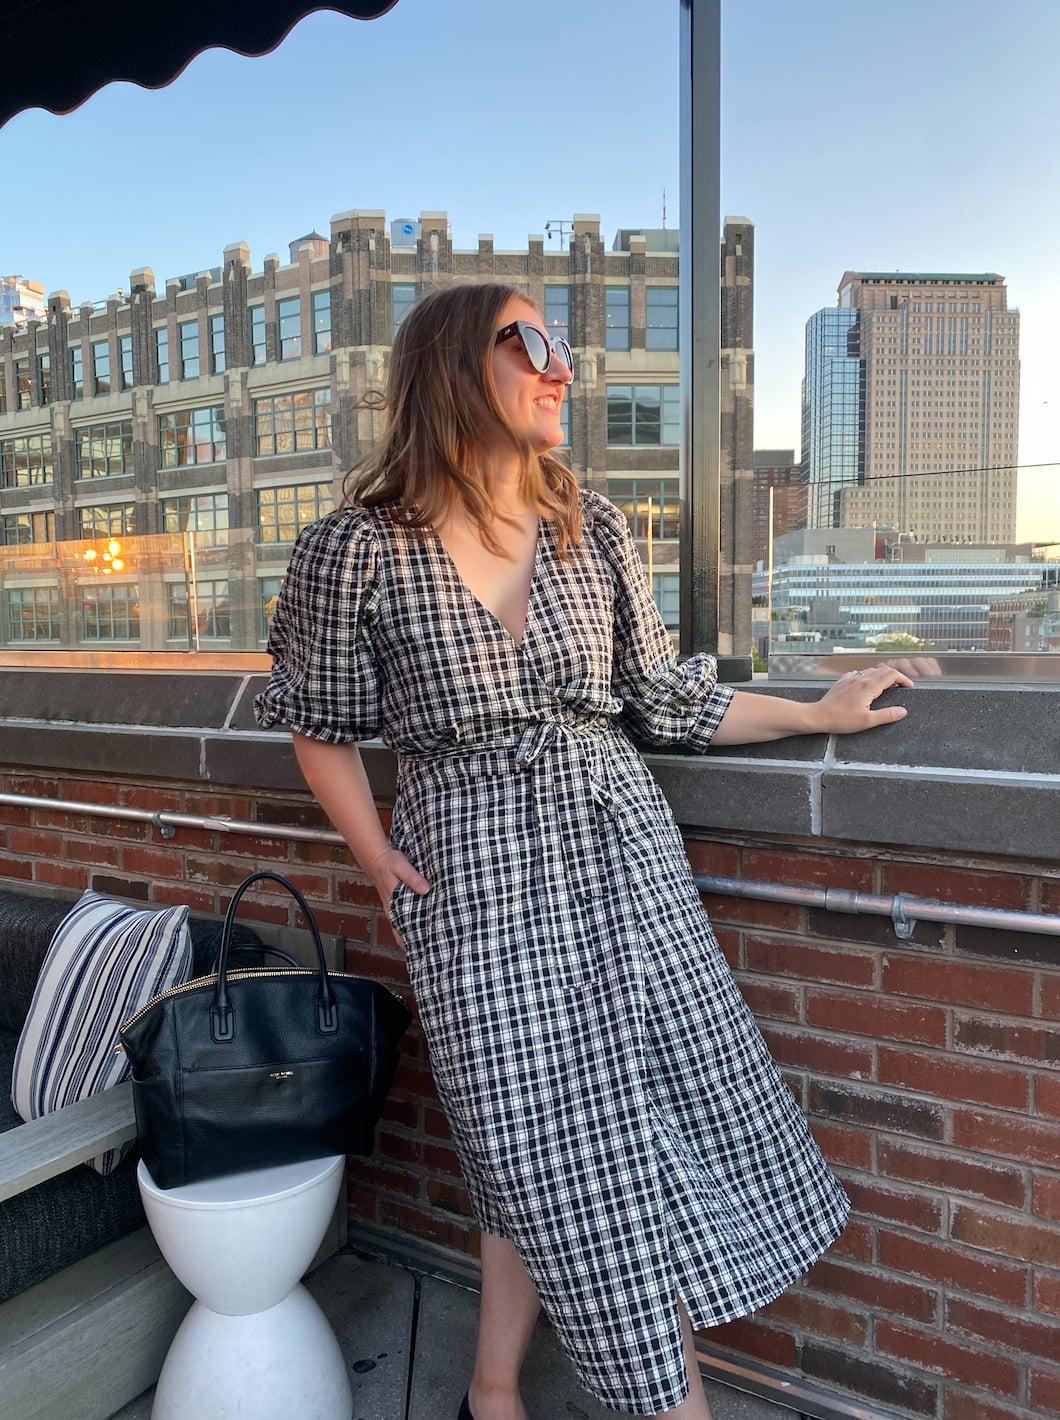 KelseyMulvey-A-New-Day-Dress-1